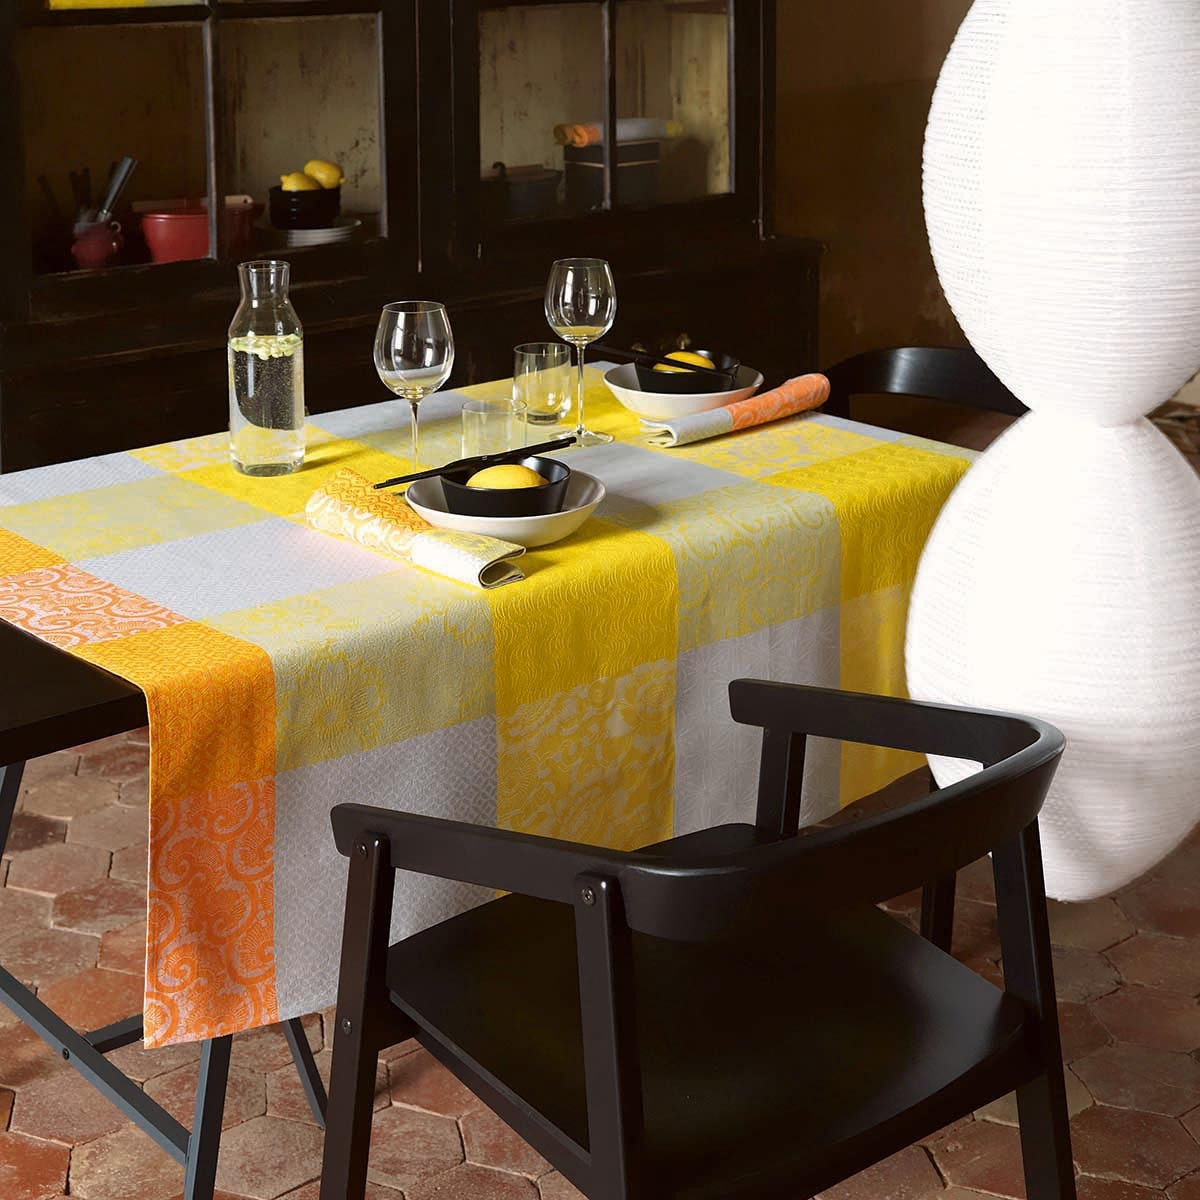 dining room table cloth. Alternative Views: Dining Room Table Cloth T